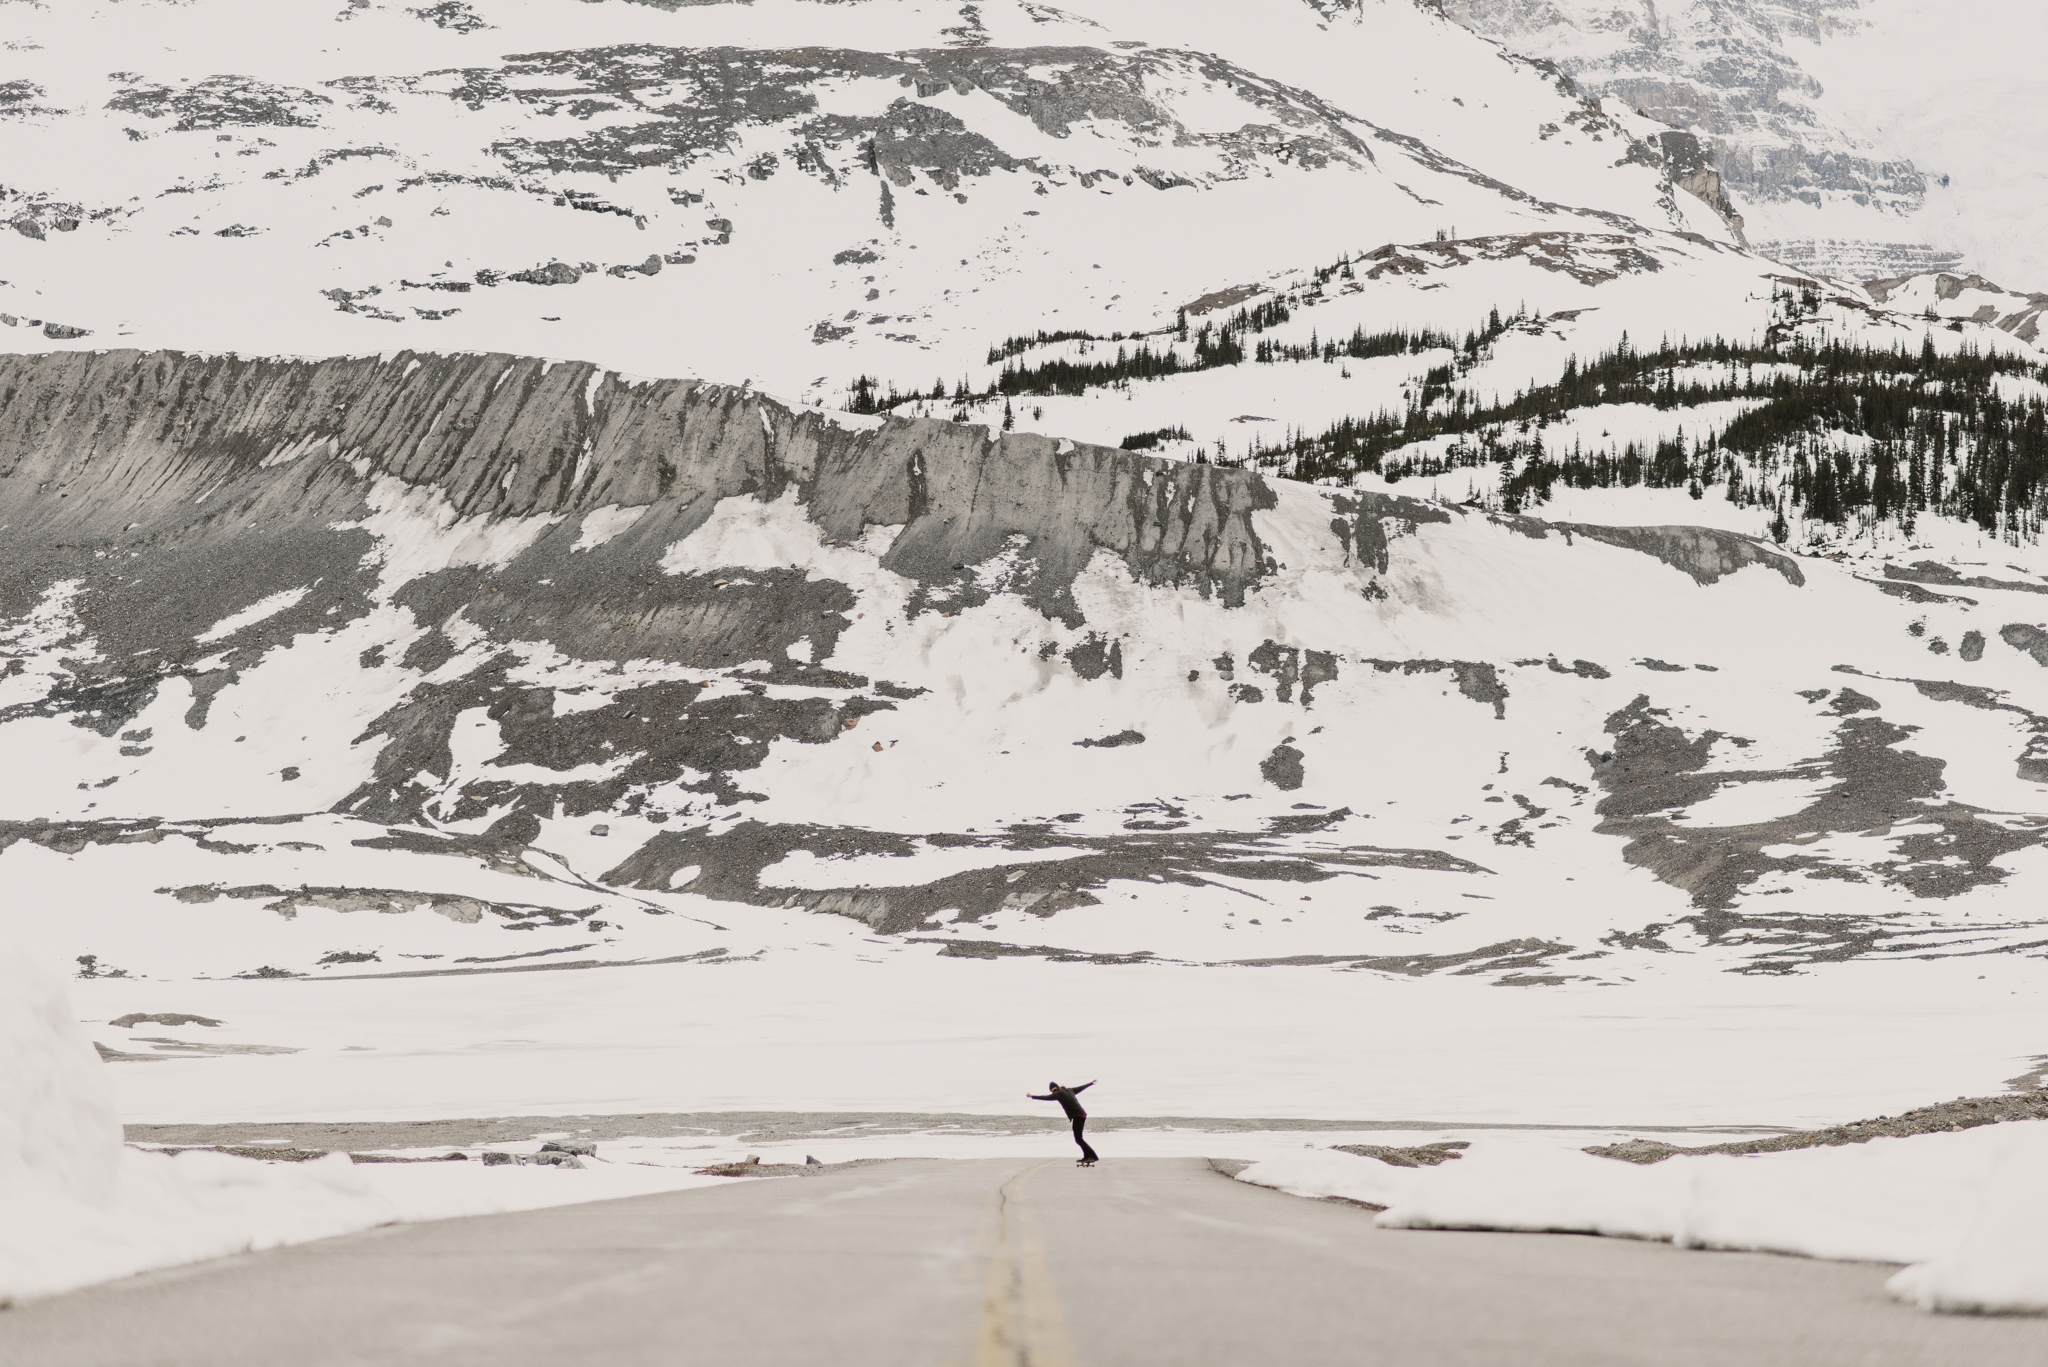 ©The-Ryans-Photo---Athabasca-Glacier,-Ice-Cave-016.jpg